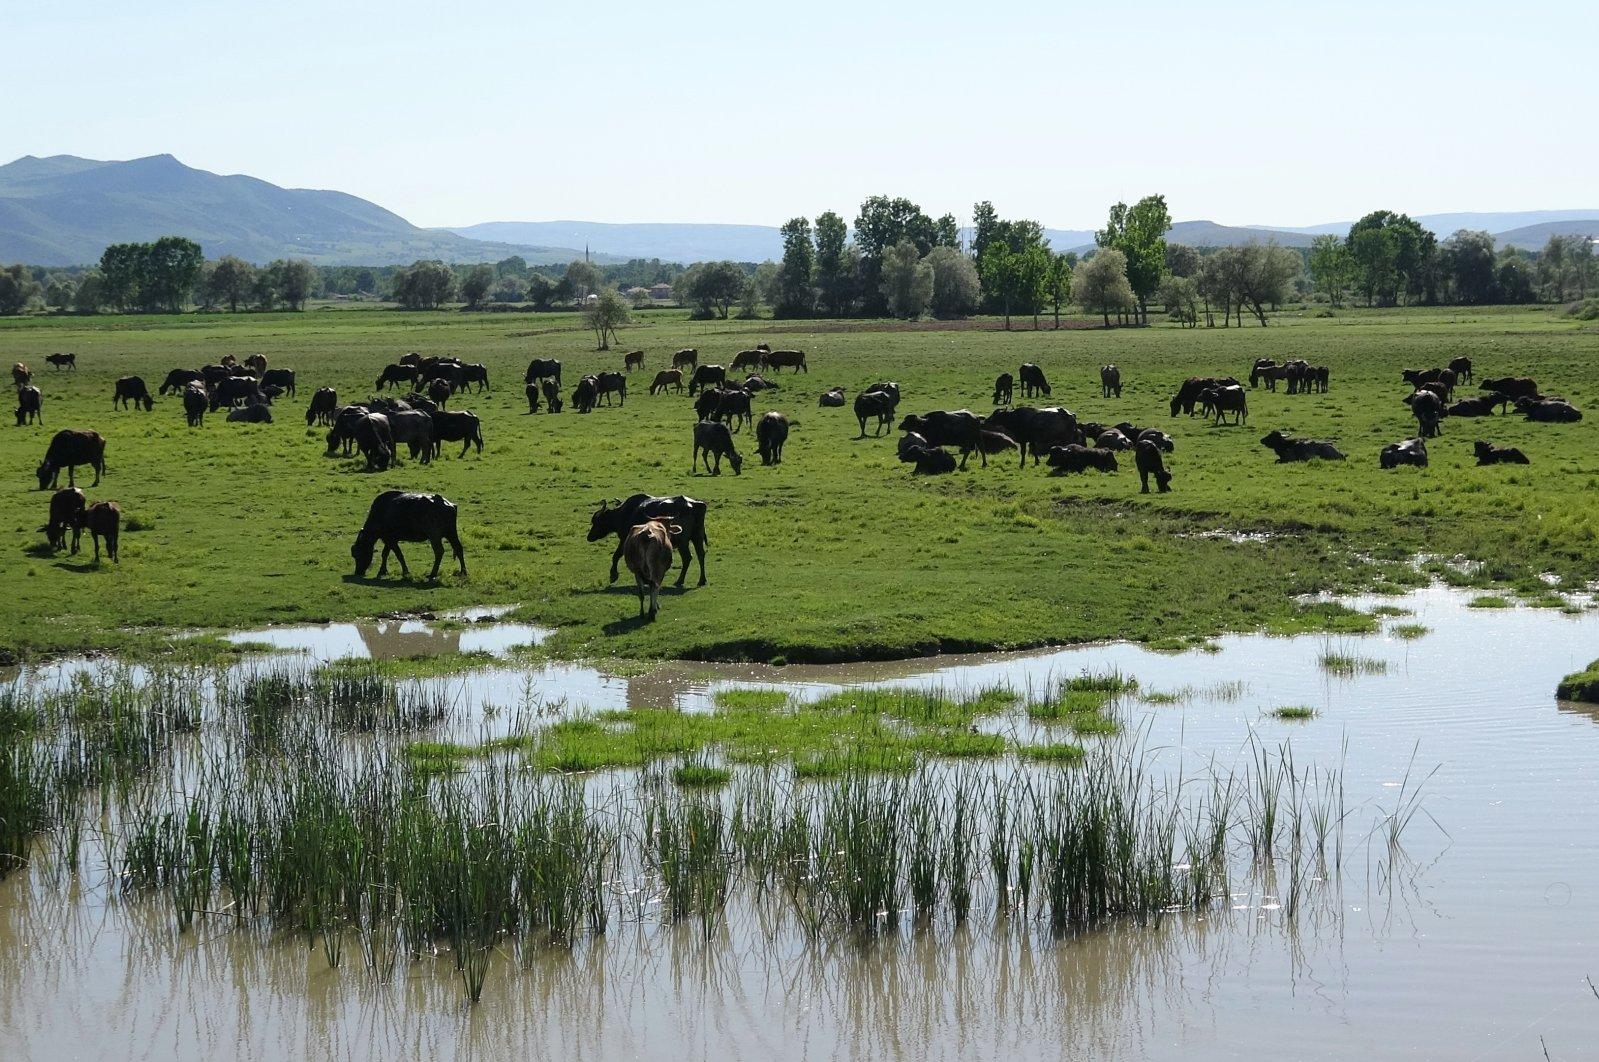 Buffalos graze in Çiftlik village in Pazar district of Tokat, northern Turkey, May 20, 2021. (IHA Photo)